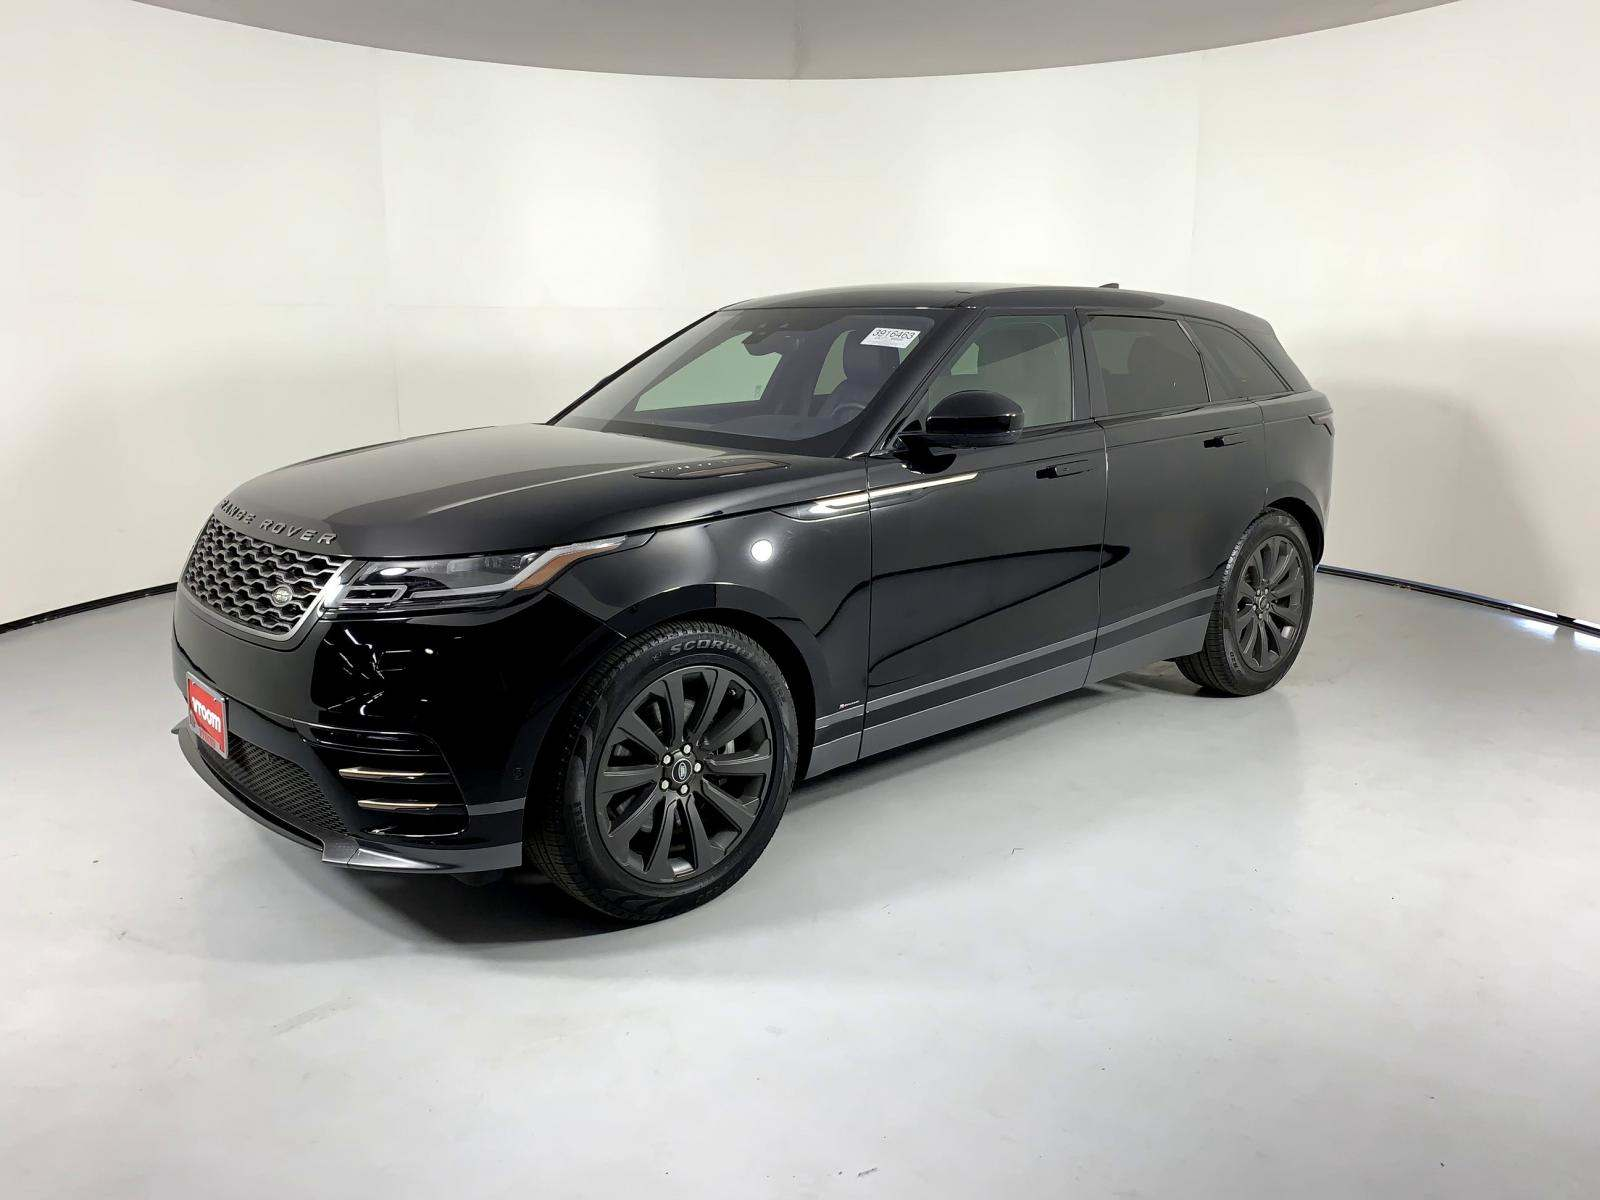 Range Rover Velar For Sale >> Used 2018 Land Rover Range Rover Velar For Sale 52 880 Vroom